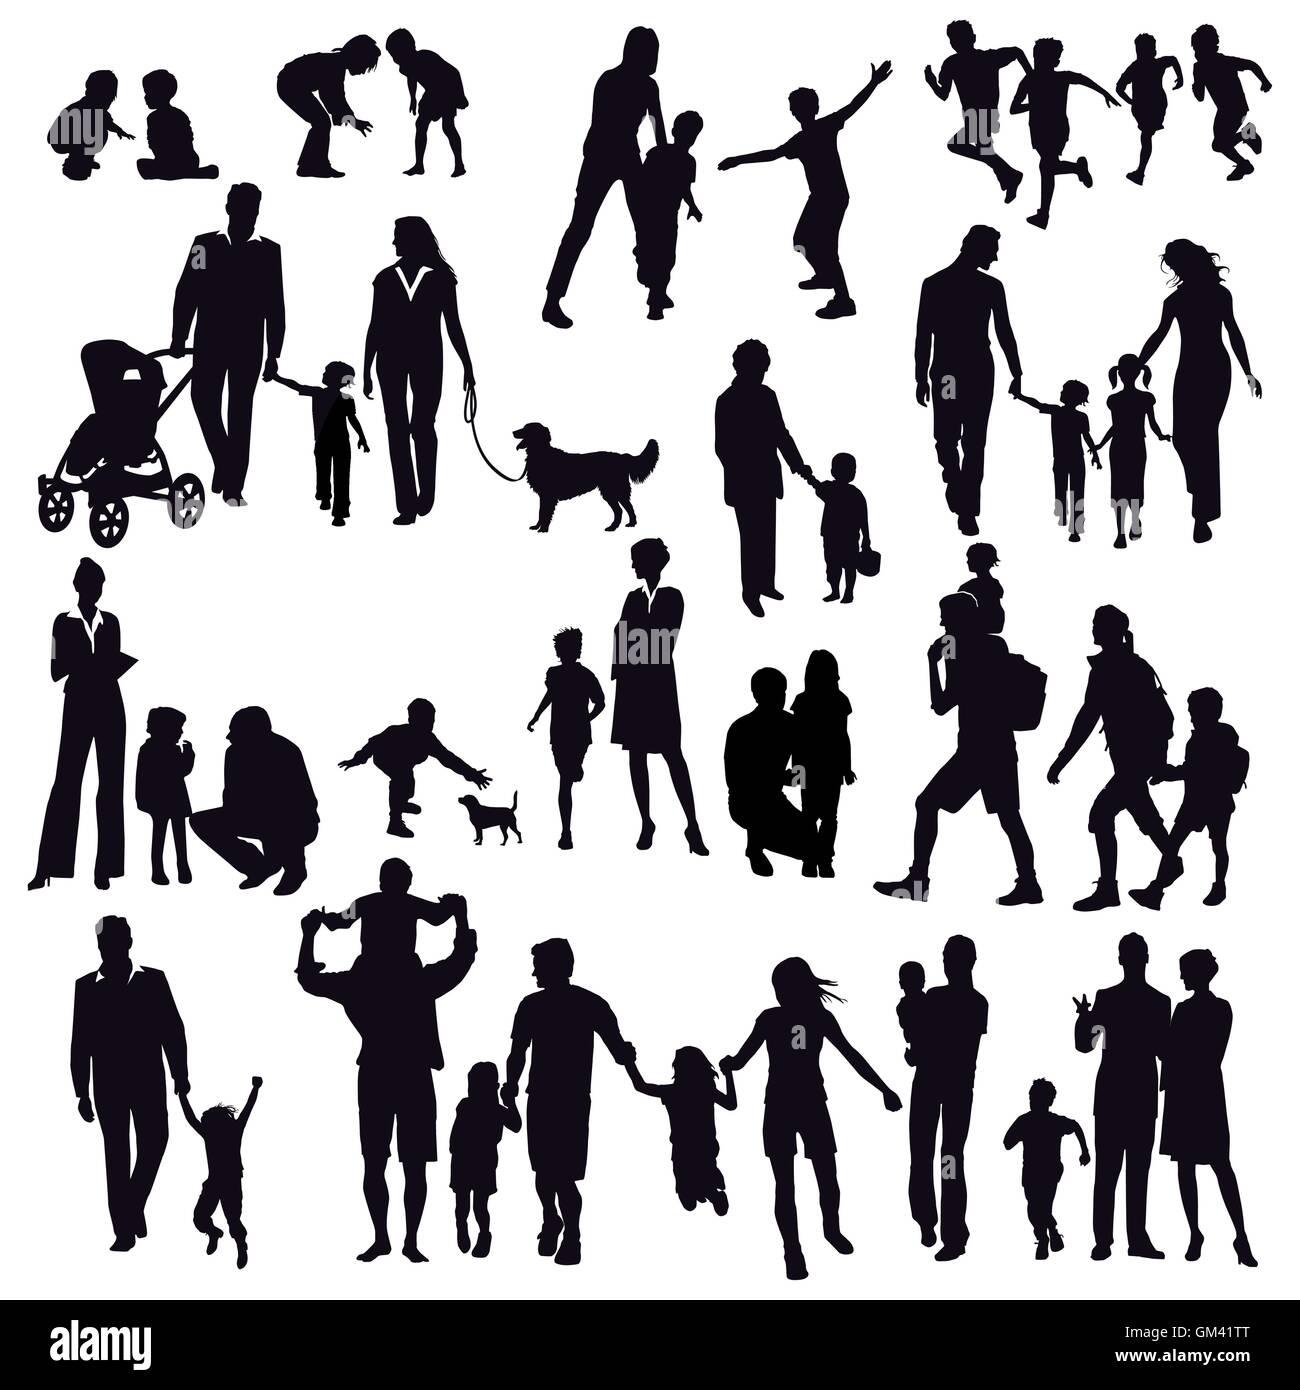 Family life - Stock Image